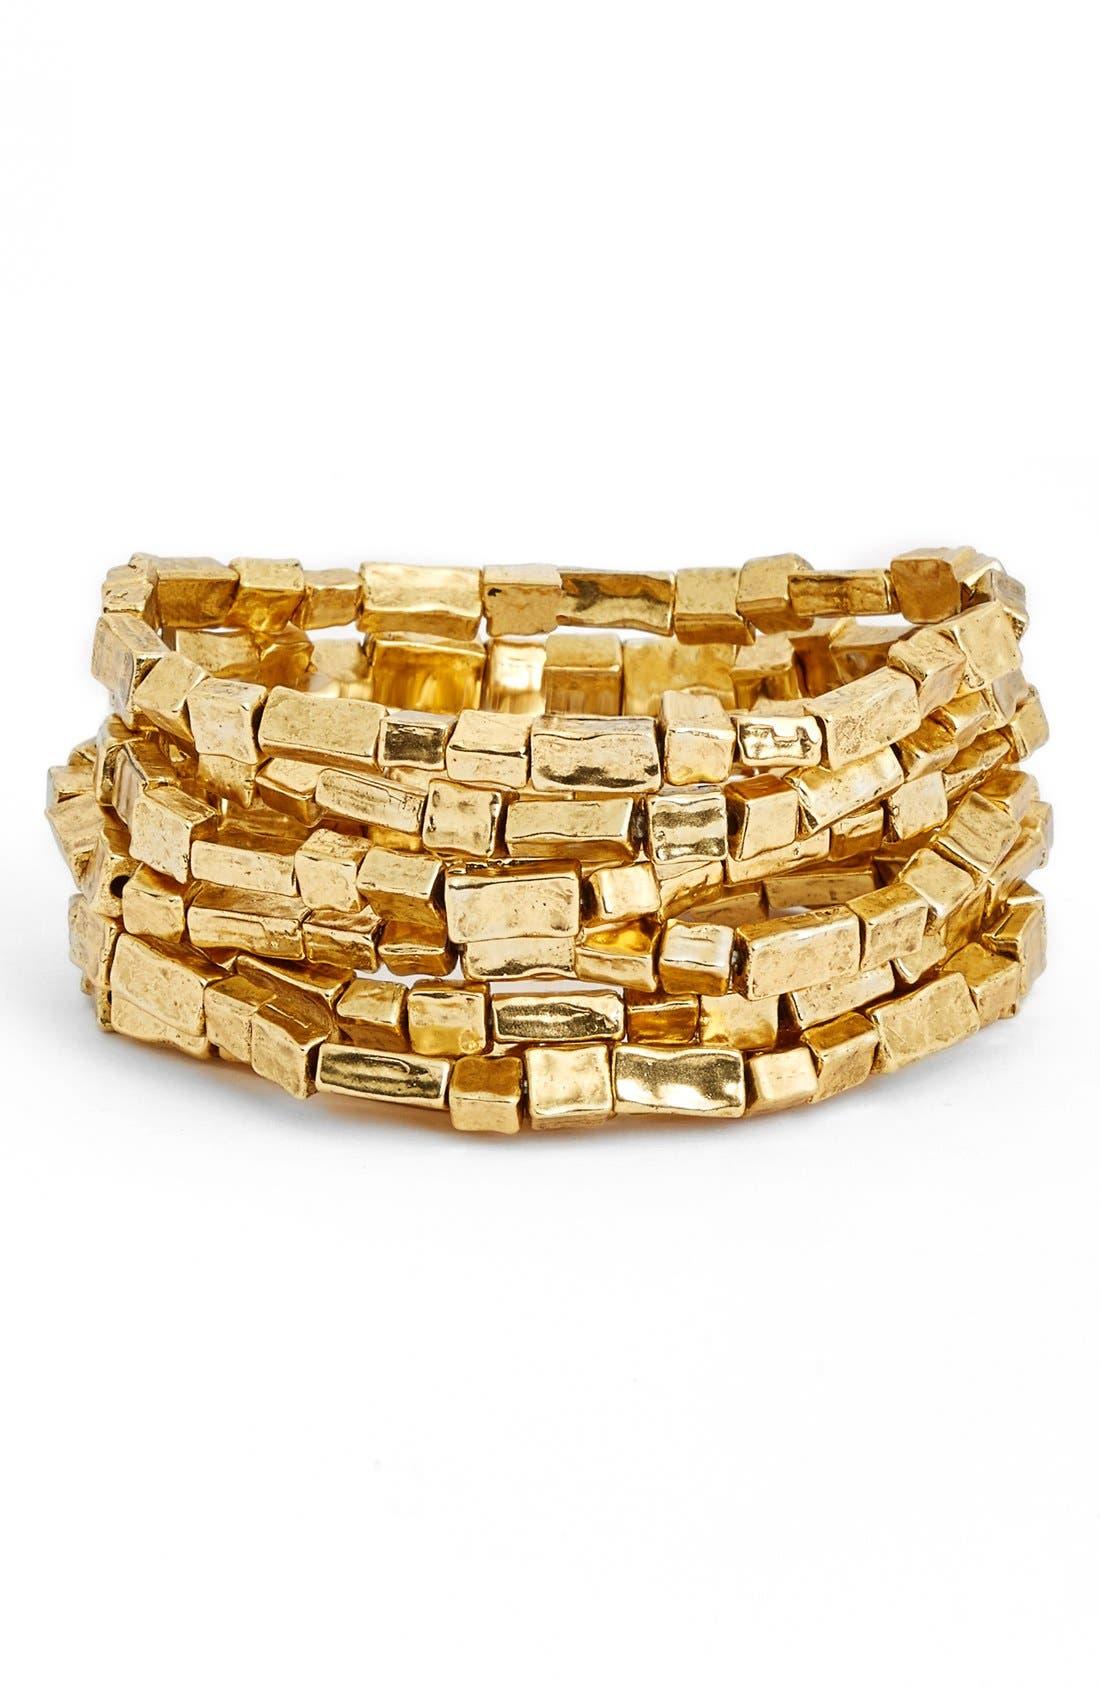 Main Image - Karine Sultan Bracelets (Set of 7)